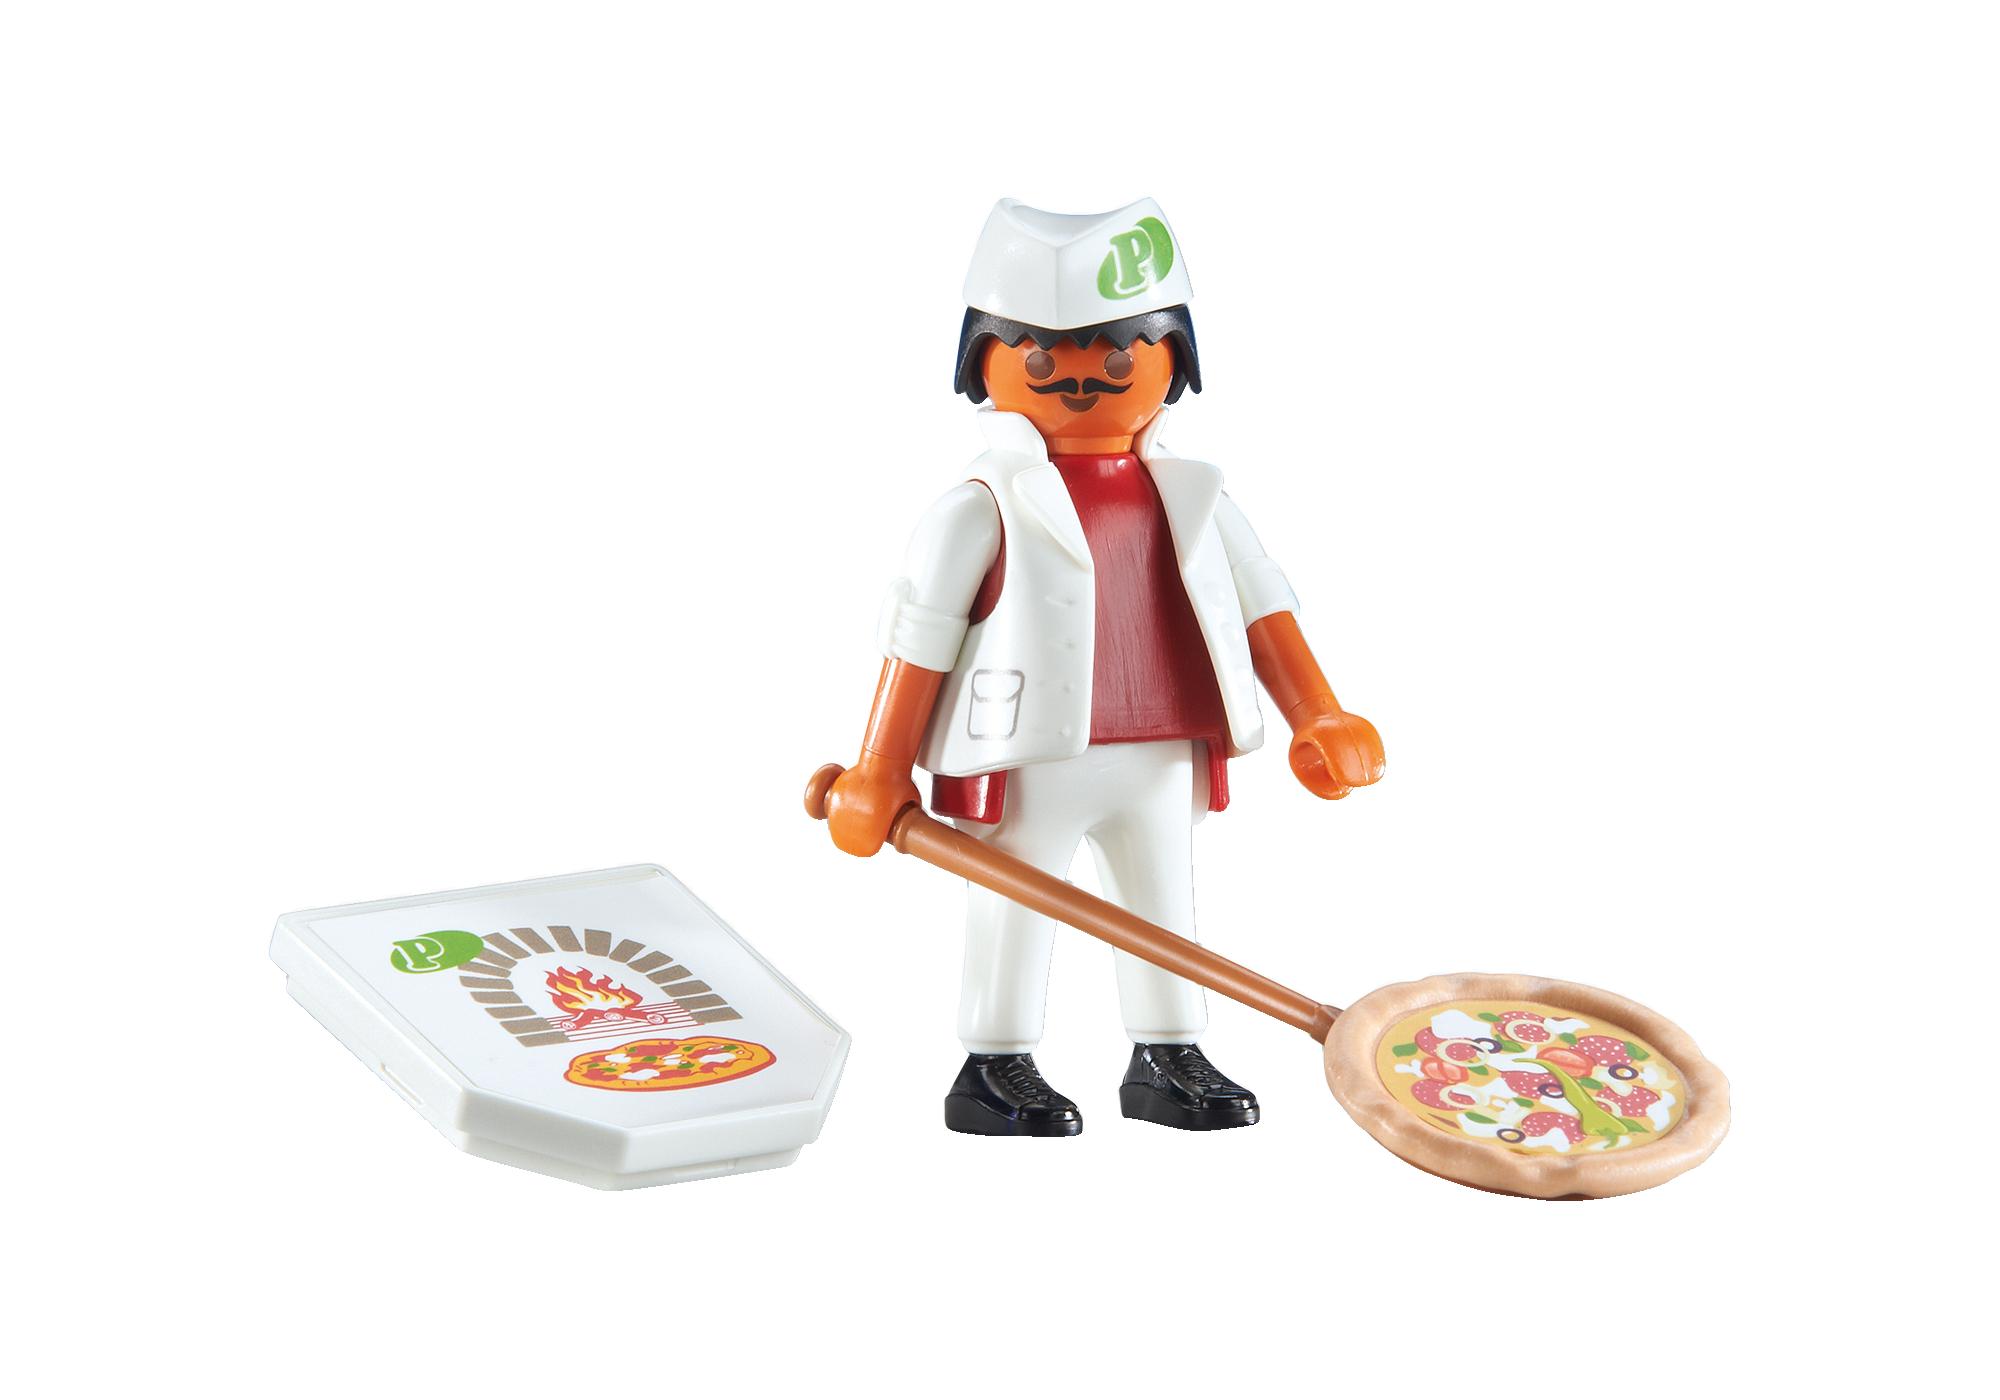 http://media.playmobil.com/i/playmobil/6392_product_detail/Pizza baker